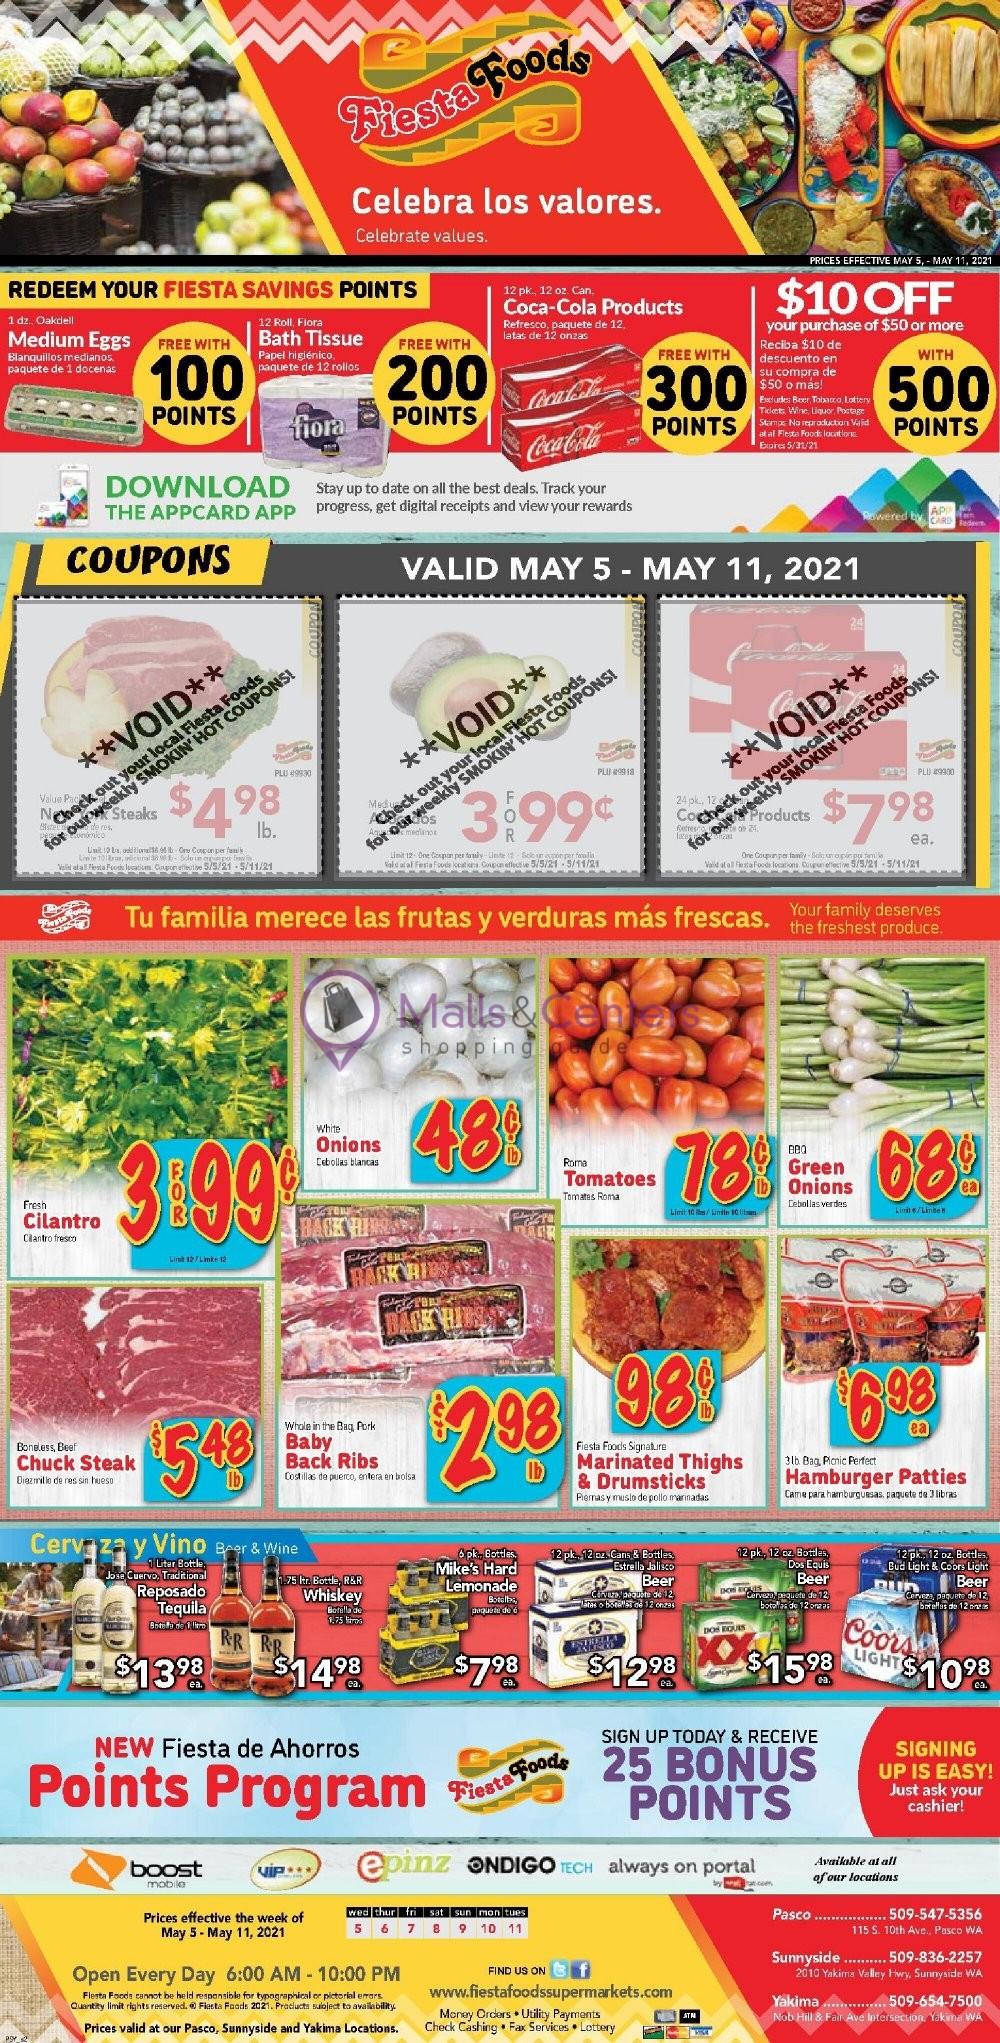 weekly ads Fiesta Foods SuperMarkets - page 1 - mallscenters.com